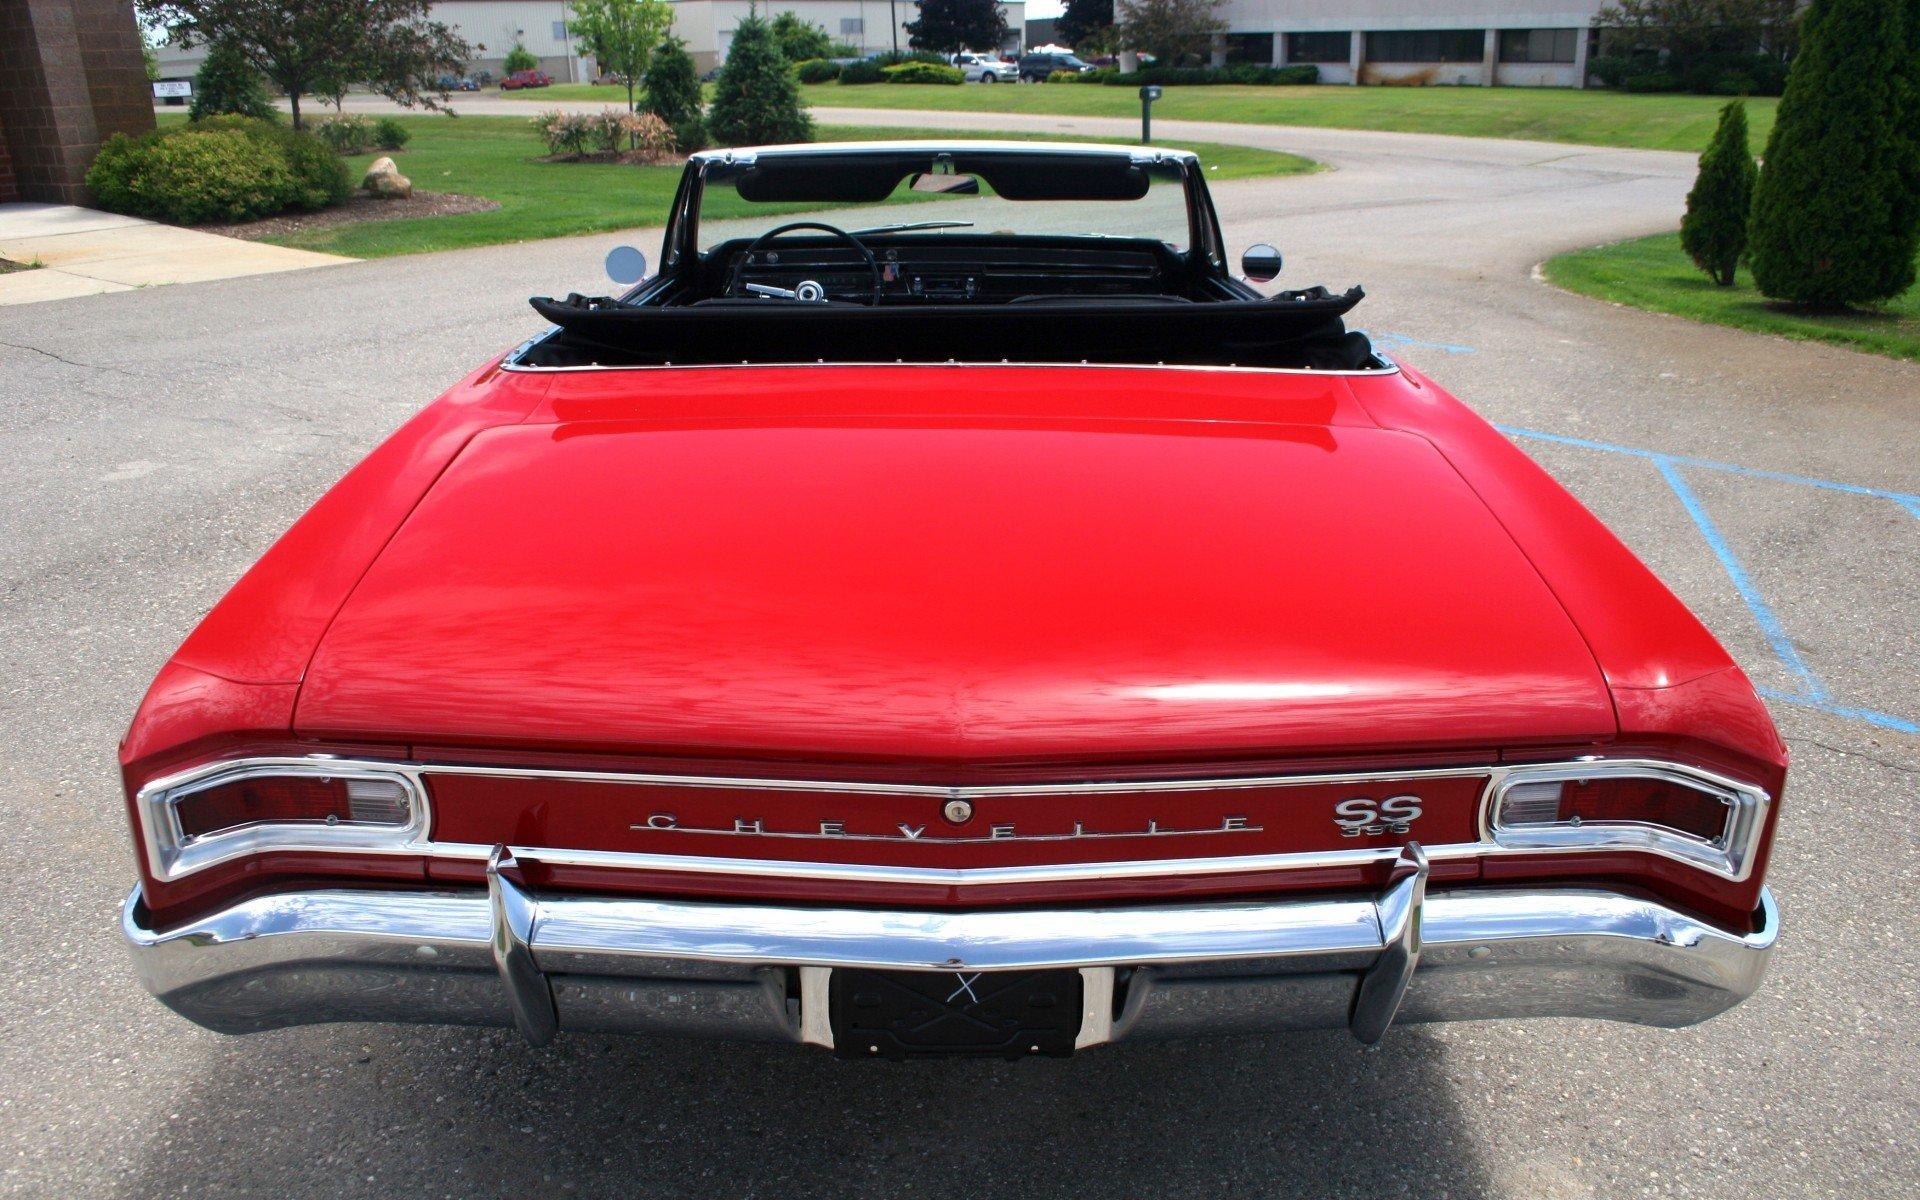 cars Chevrolet vehicles Chevrolet Chevelle SS wallpaper background 1920x1200